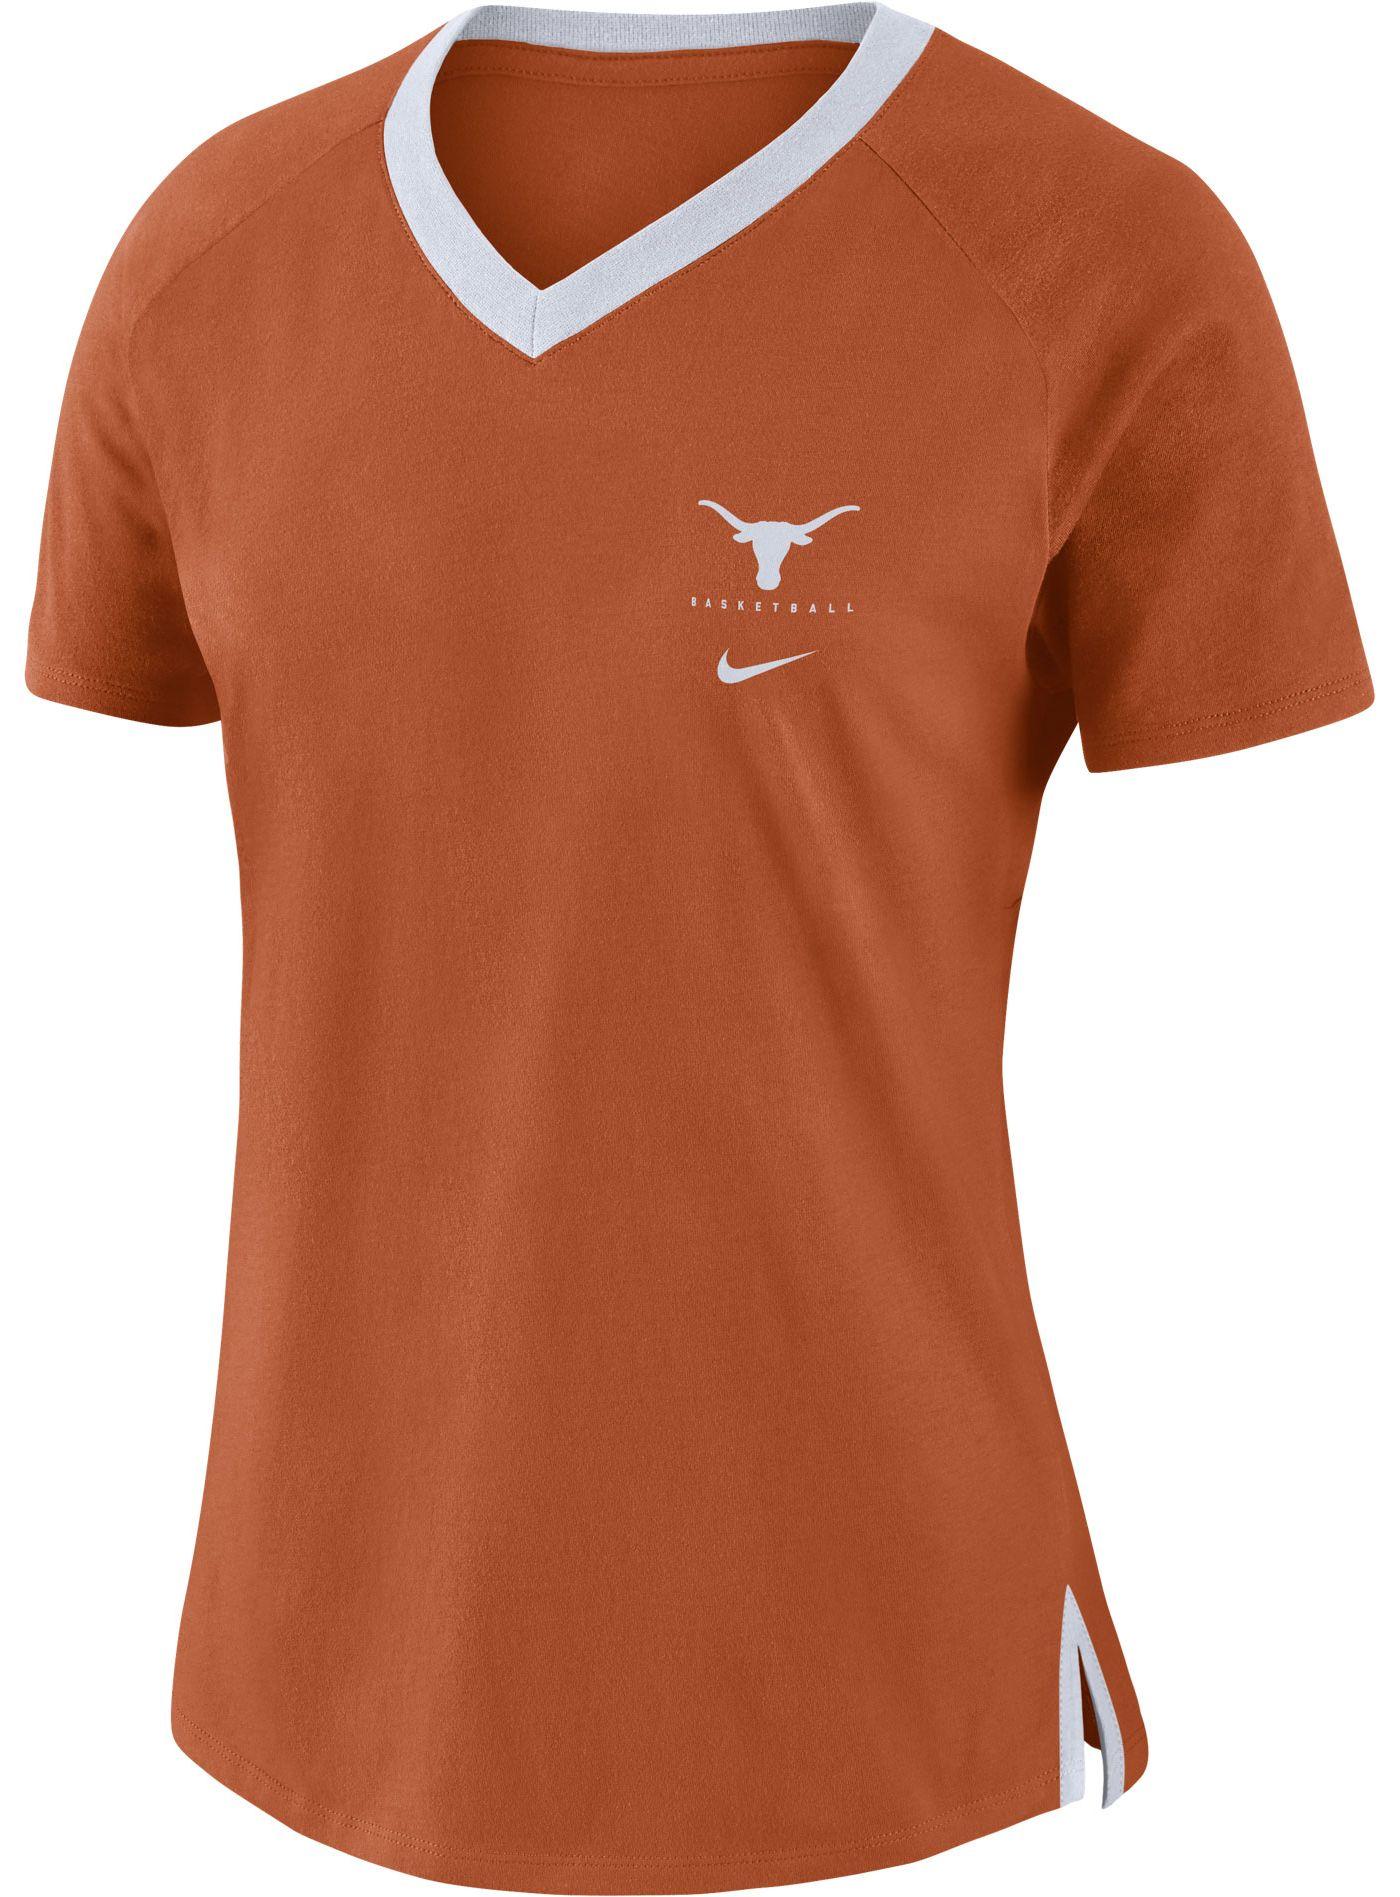 Nike Women's Texas Longhorns Burnt Orange Tri-Blend Basketball Fan T-Shirt